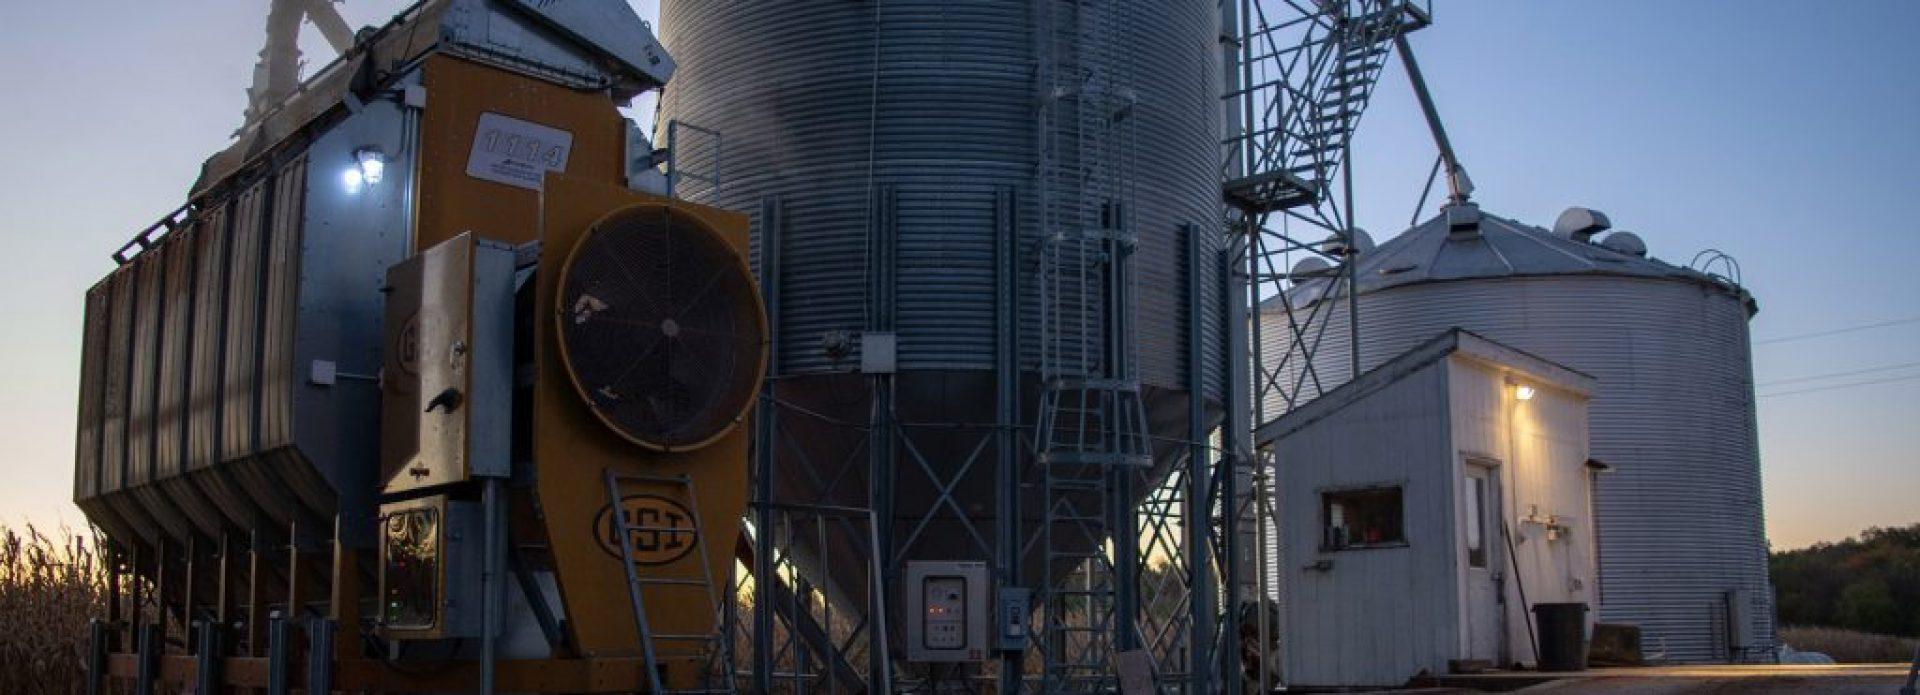 Eldon-C-Stutsman-Inc-Grain-Handling (6)